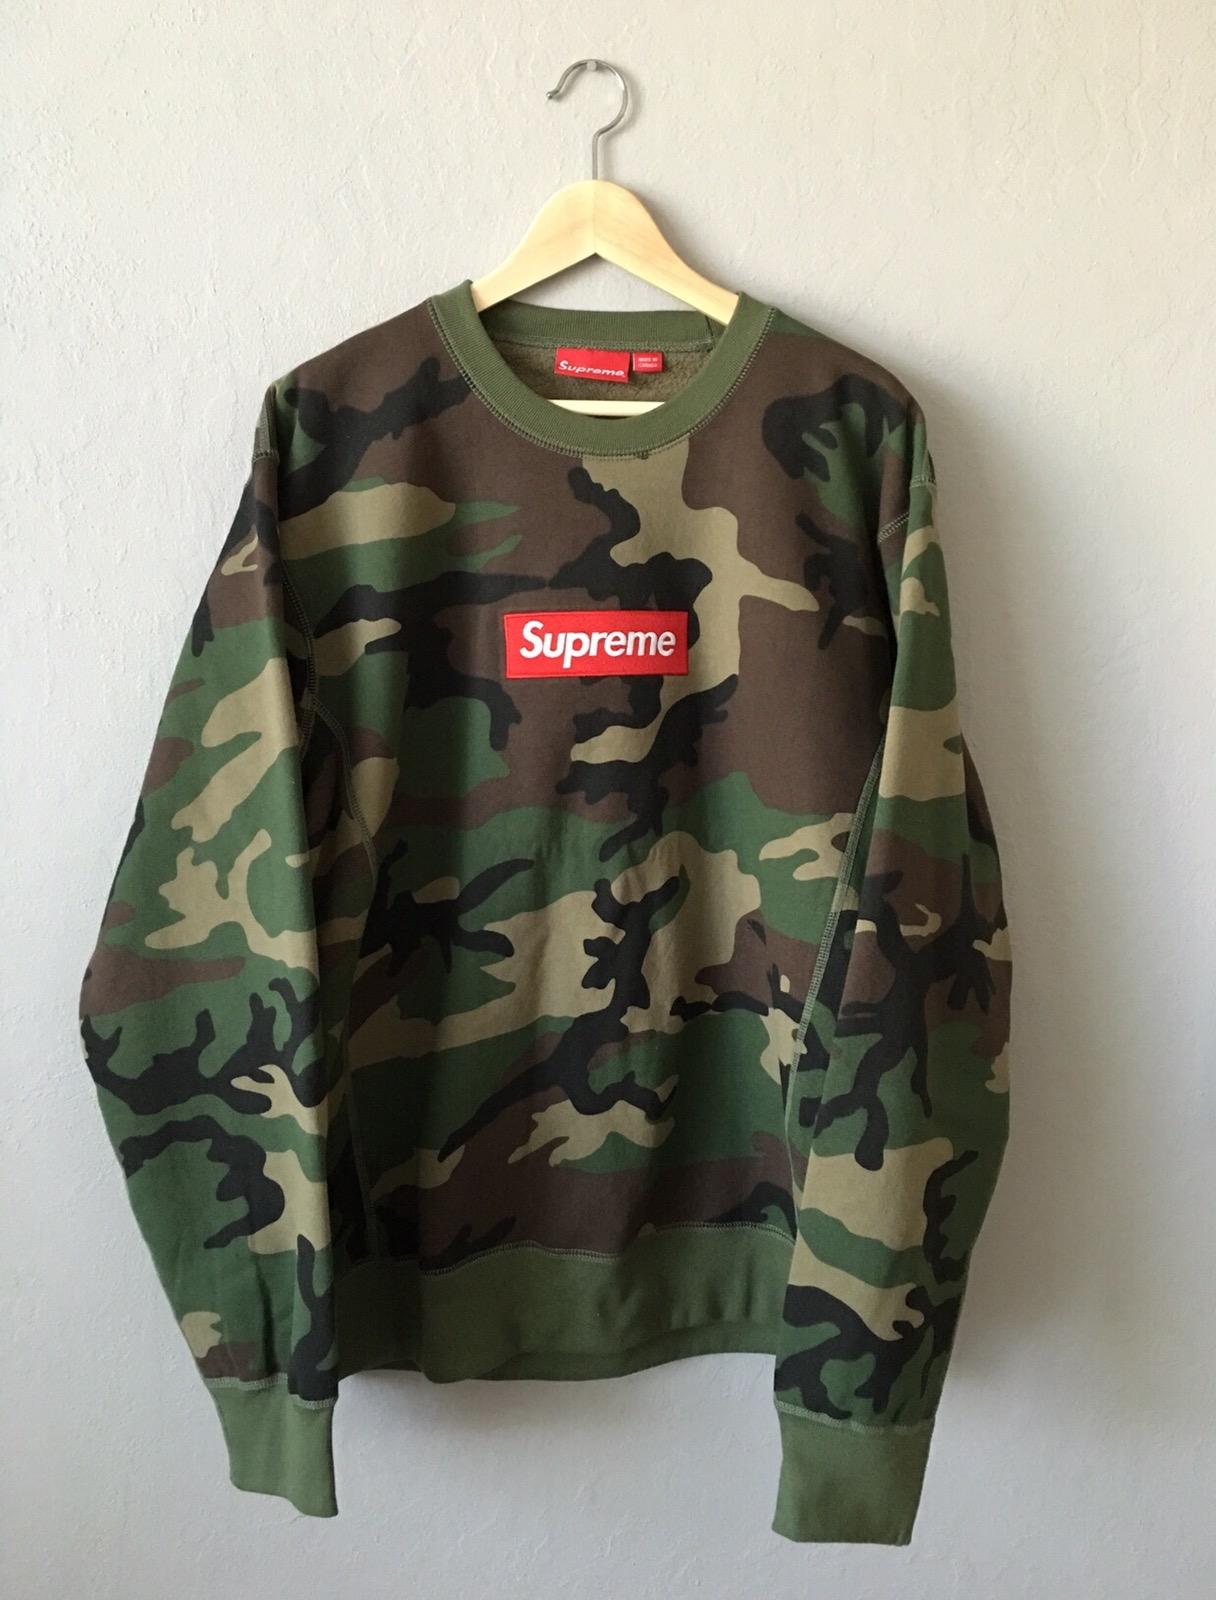 4295c8c9a4f4 Supreme Supreme Crewneck Woodland Camo Bogo Size xl - Sweatshirts   Hoodies  for Sale - Grailed